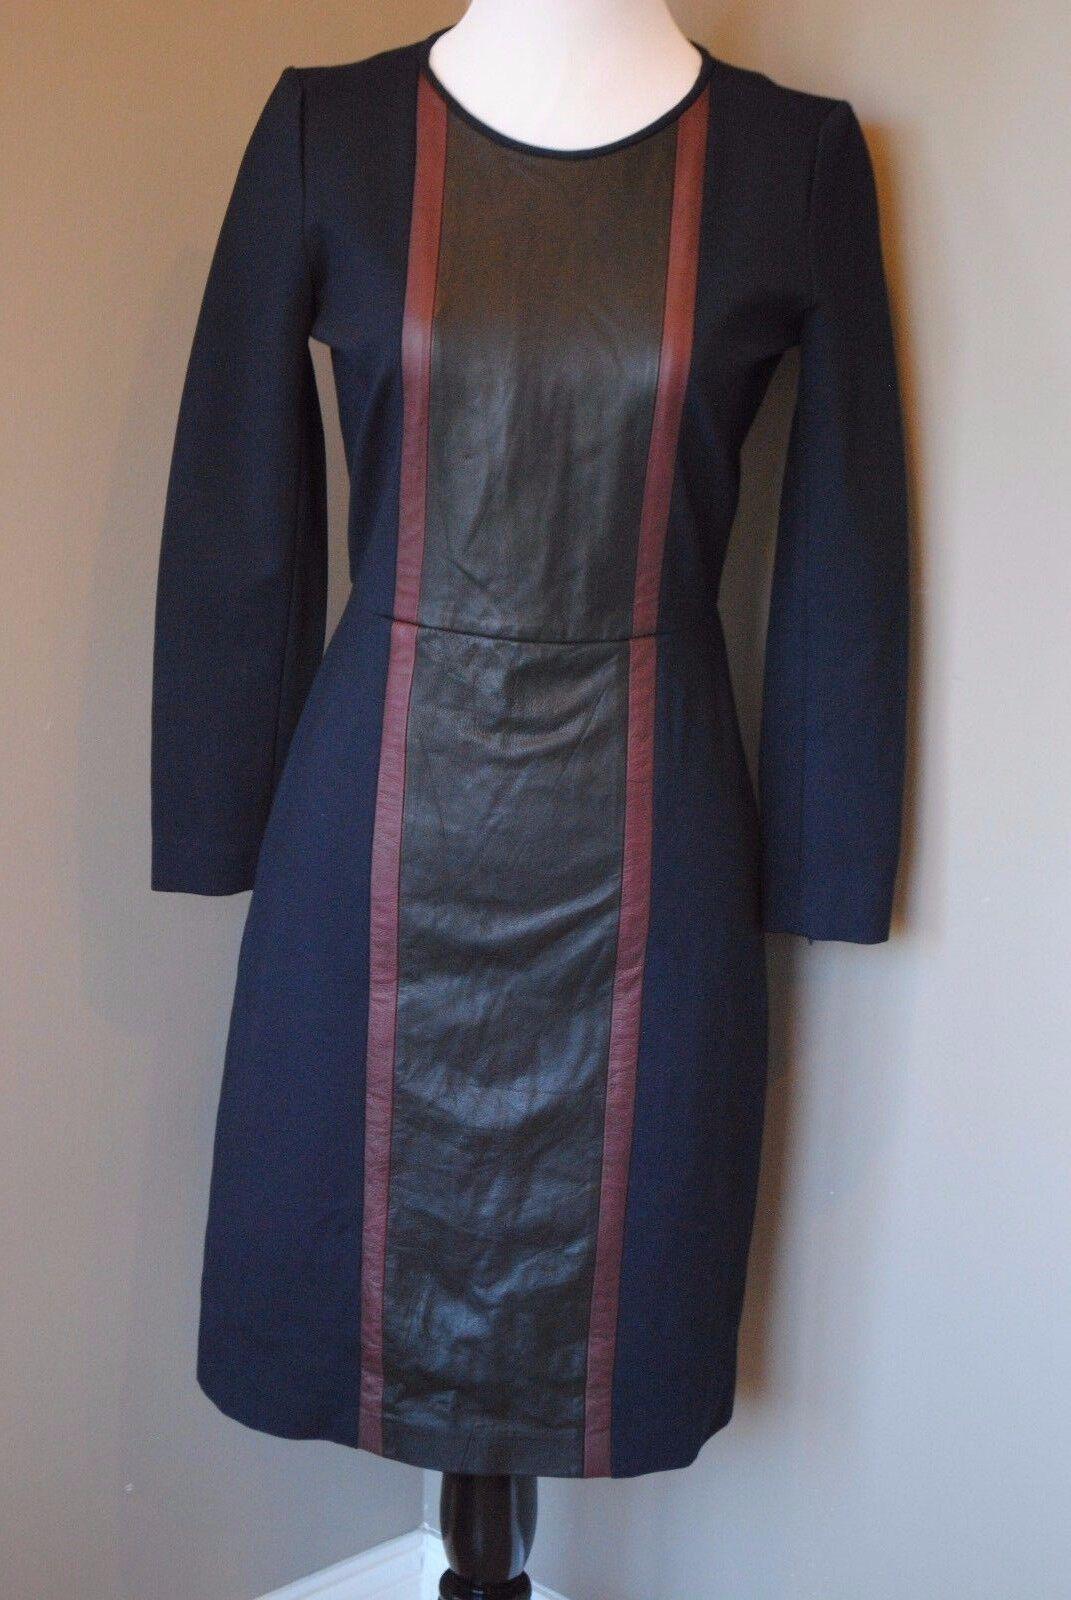 NWT J Crew Petite Leather Panel Dress Day to Night 0 0P B3700  Navy Multi